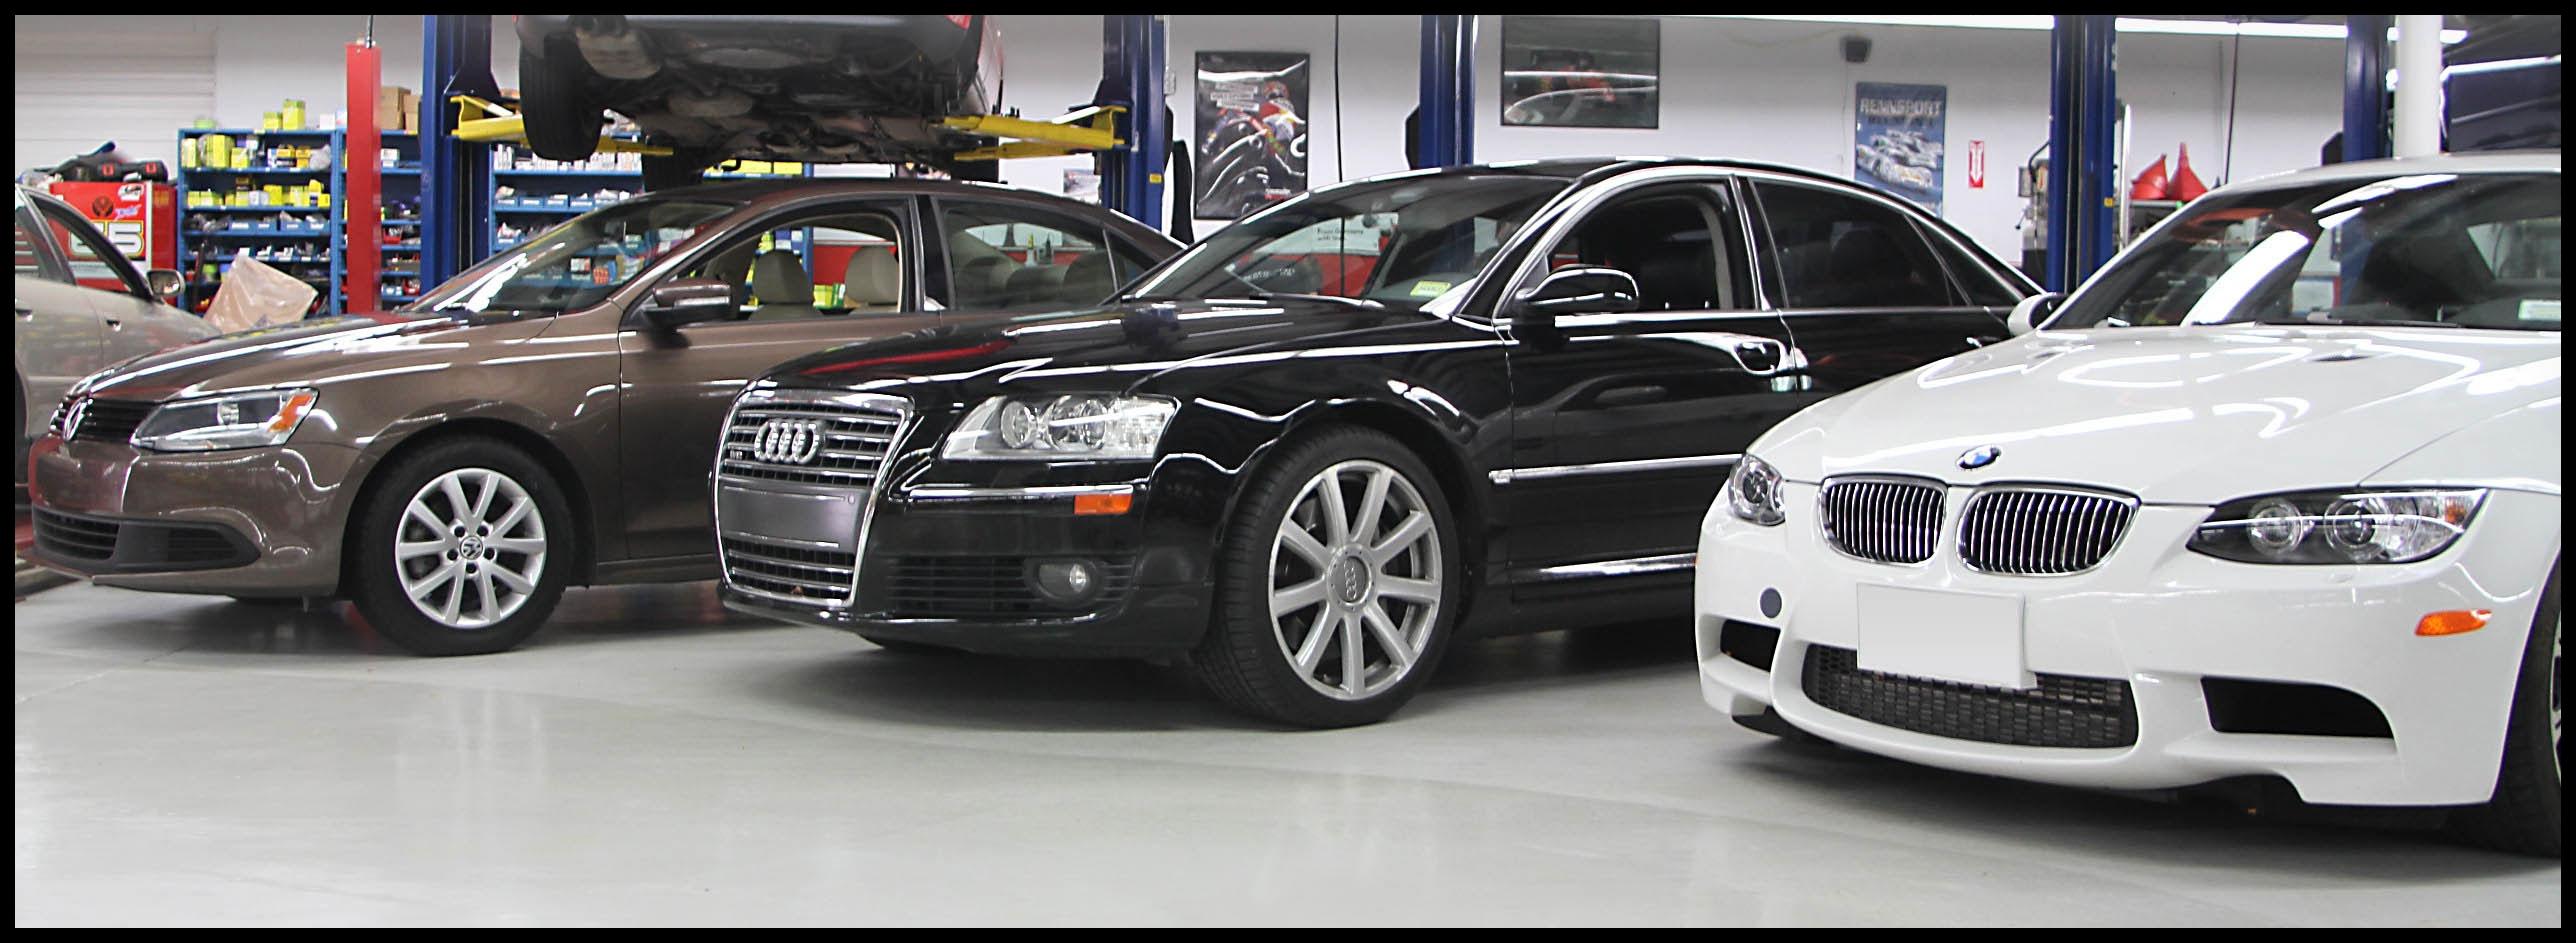 SST Auto shop variety